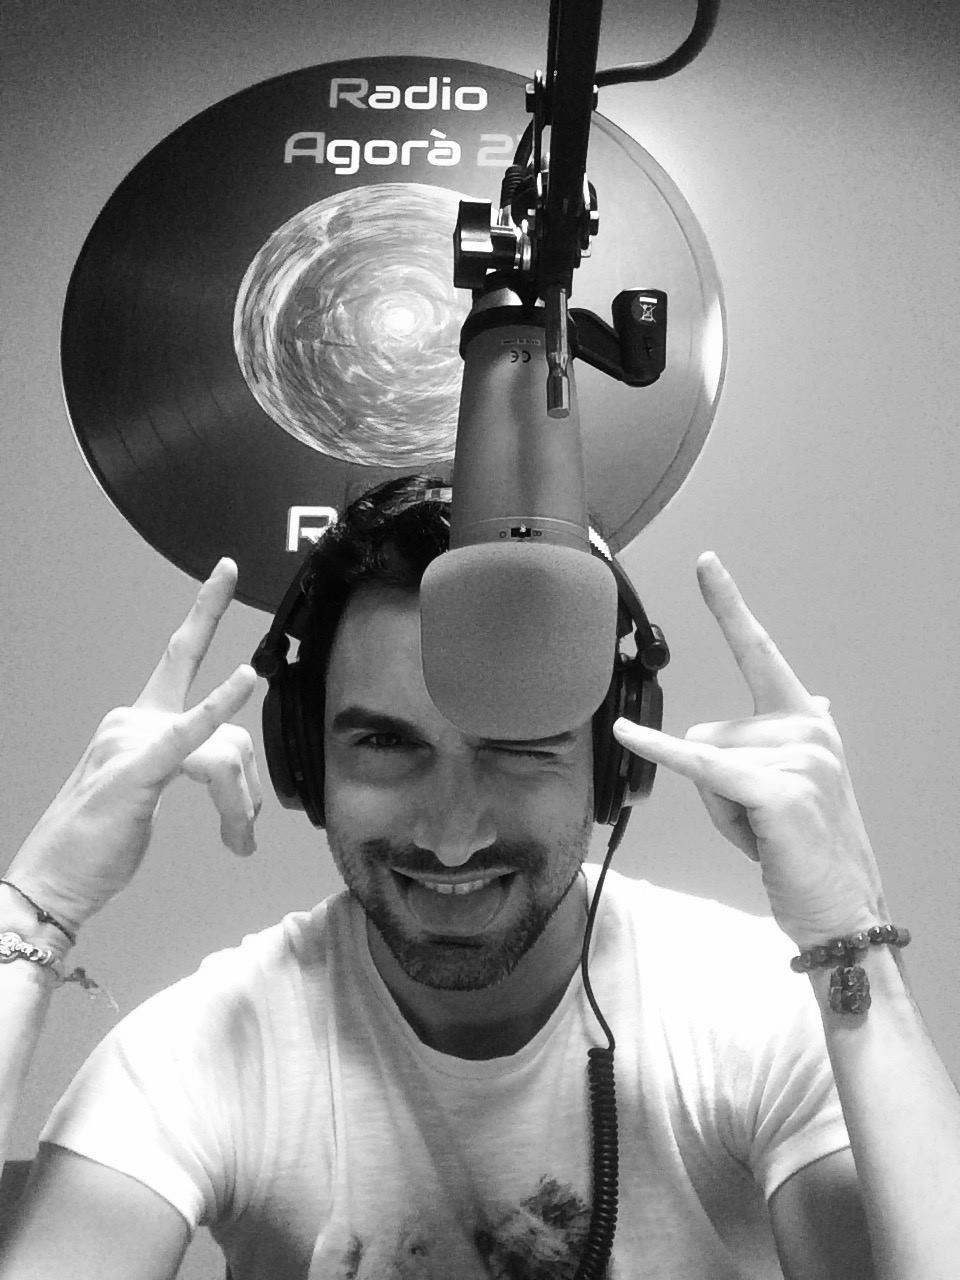 Beppe Riggio - Orbis Sanus News - Radio Agorà 21 Orbassano